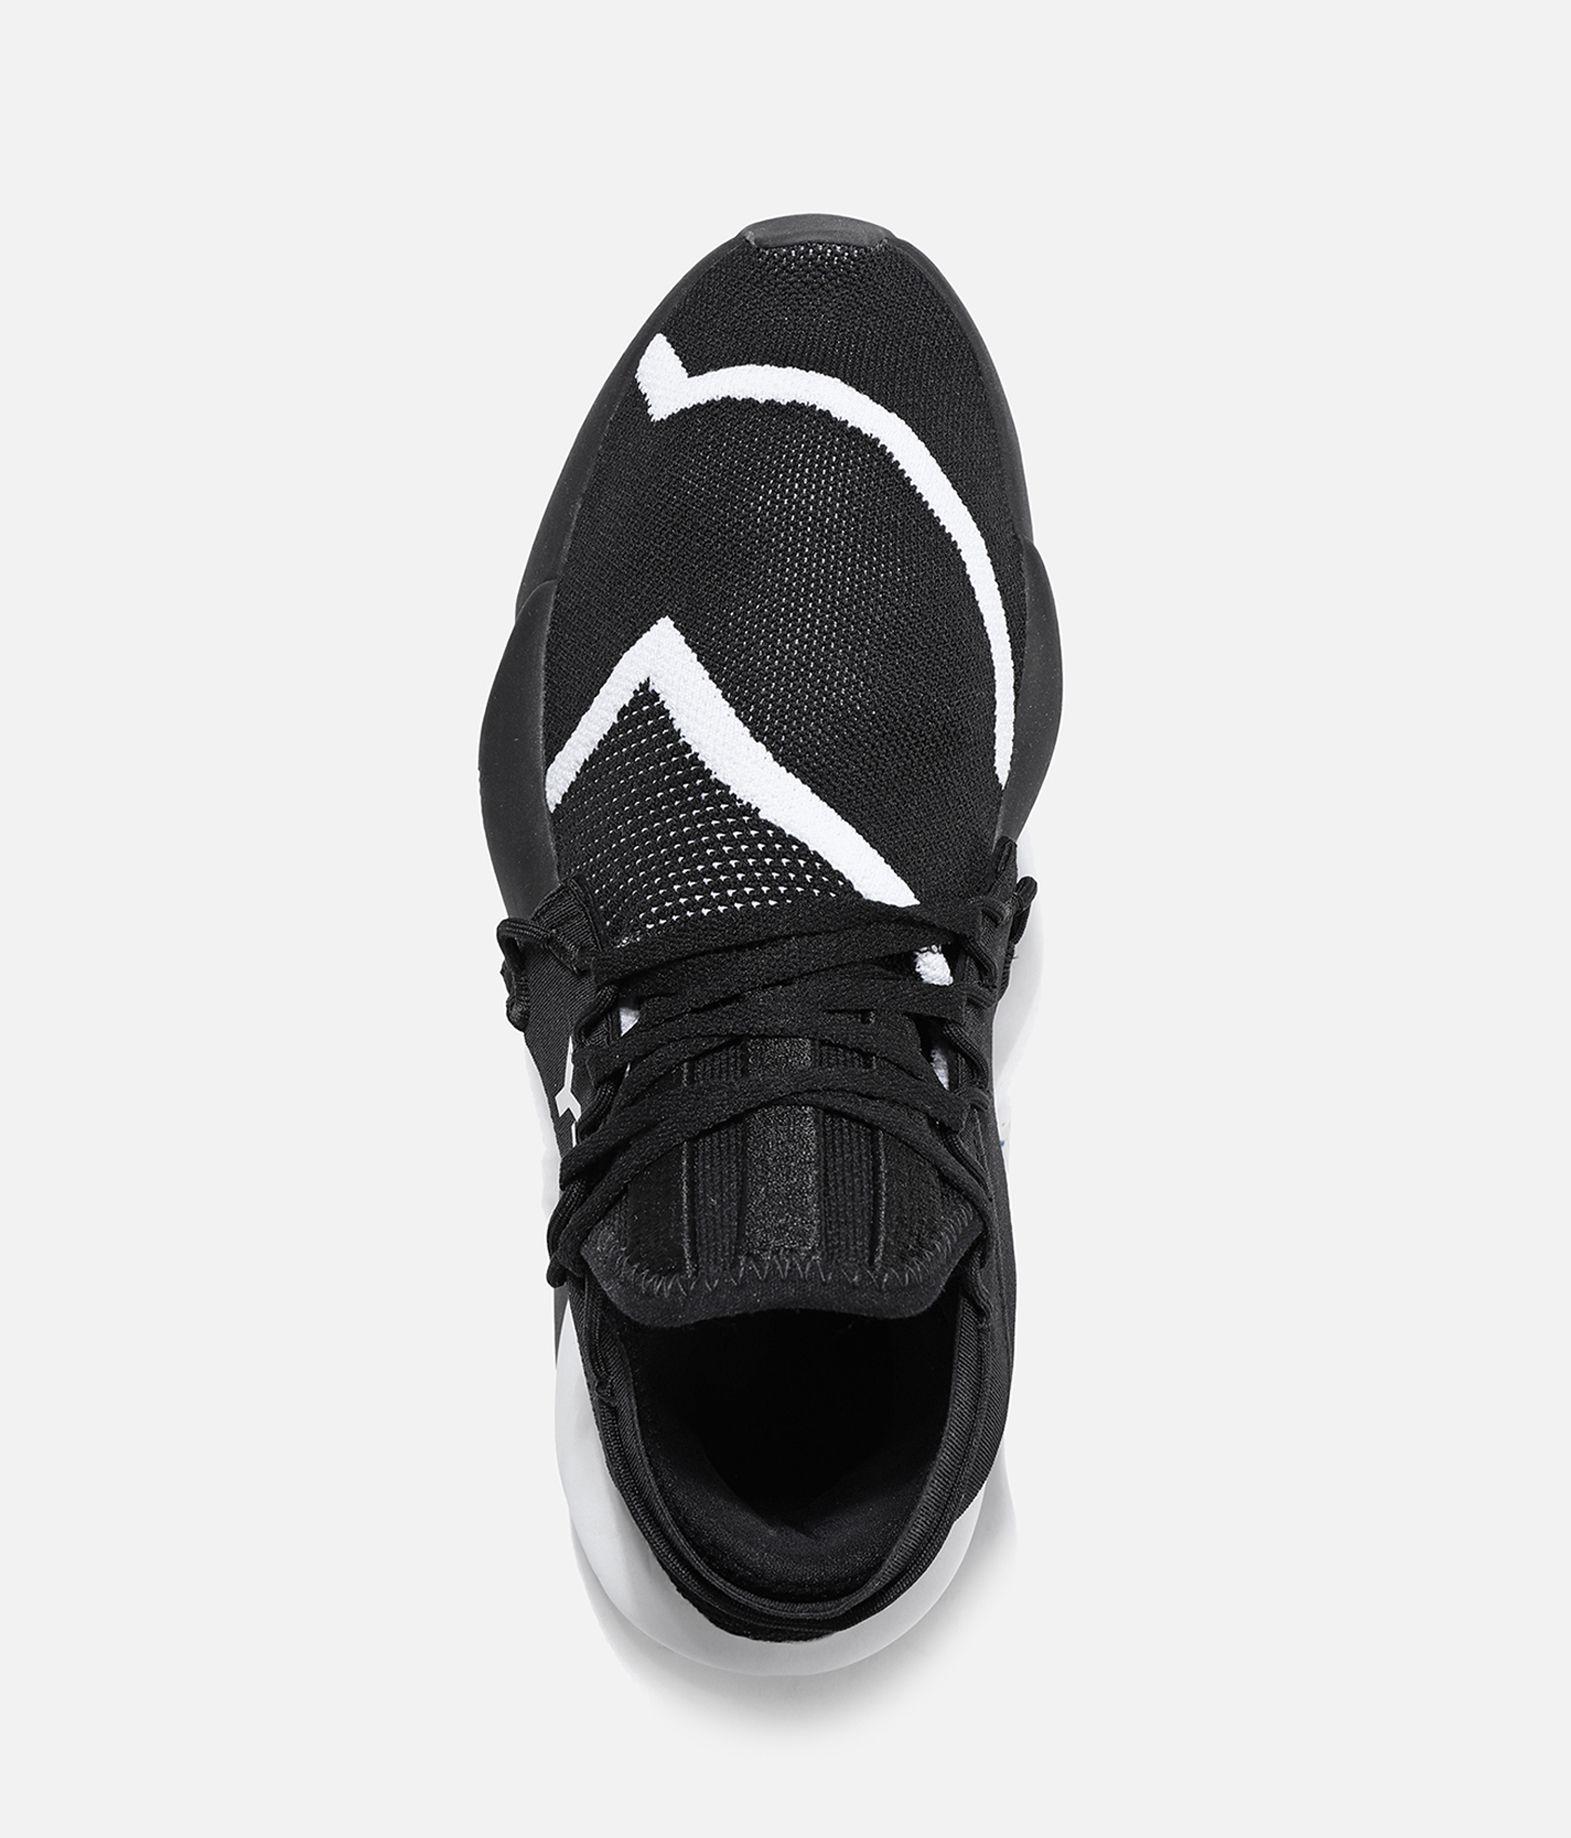 Y-3 Y-3 Kaiwa Knit Sneakers E c